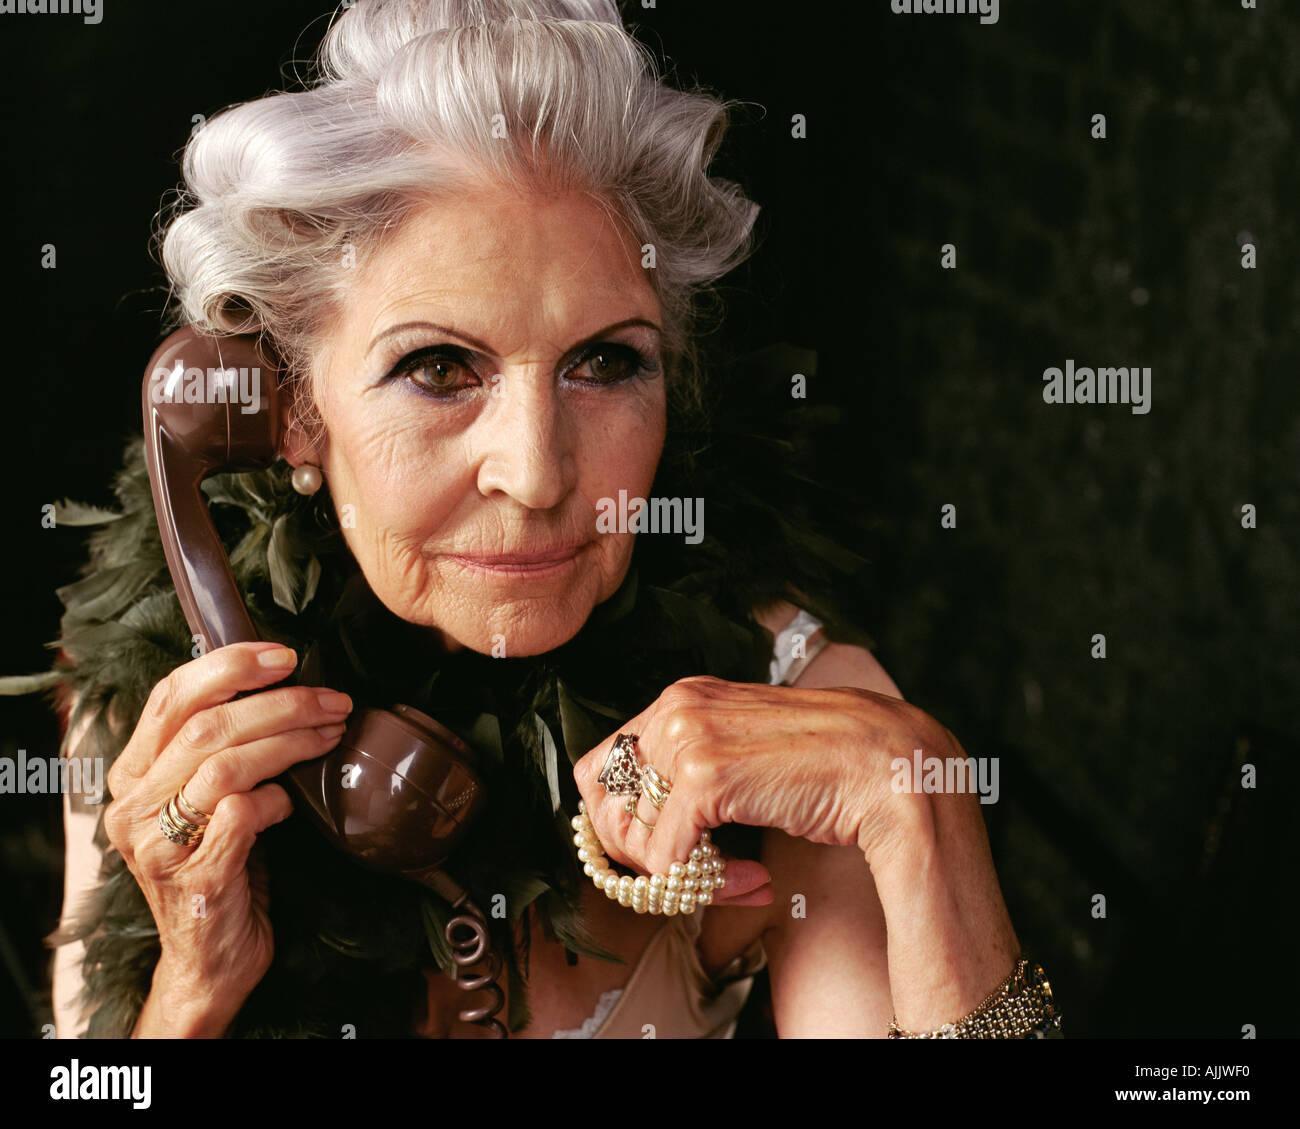 Glamorous senior woman on the telephone - Stock Image